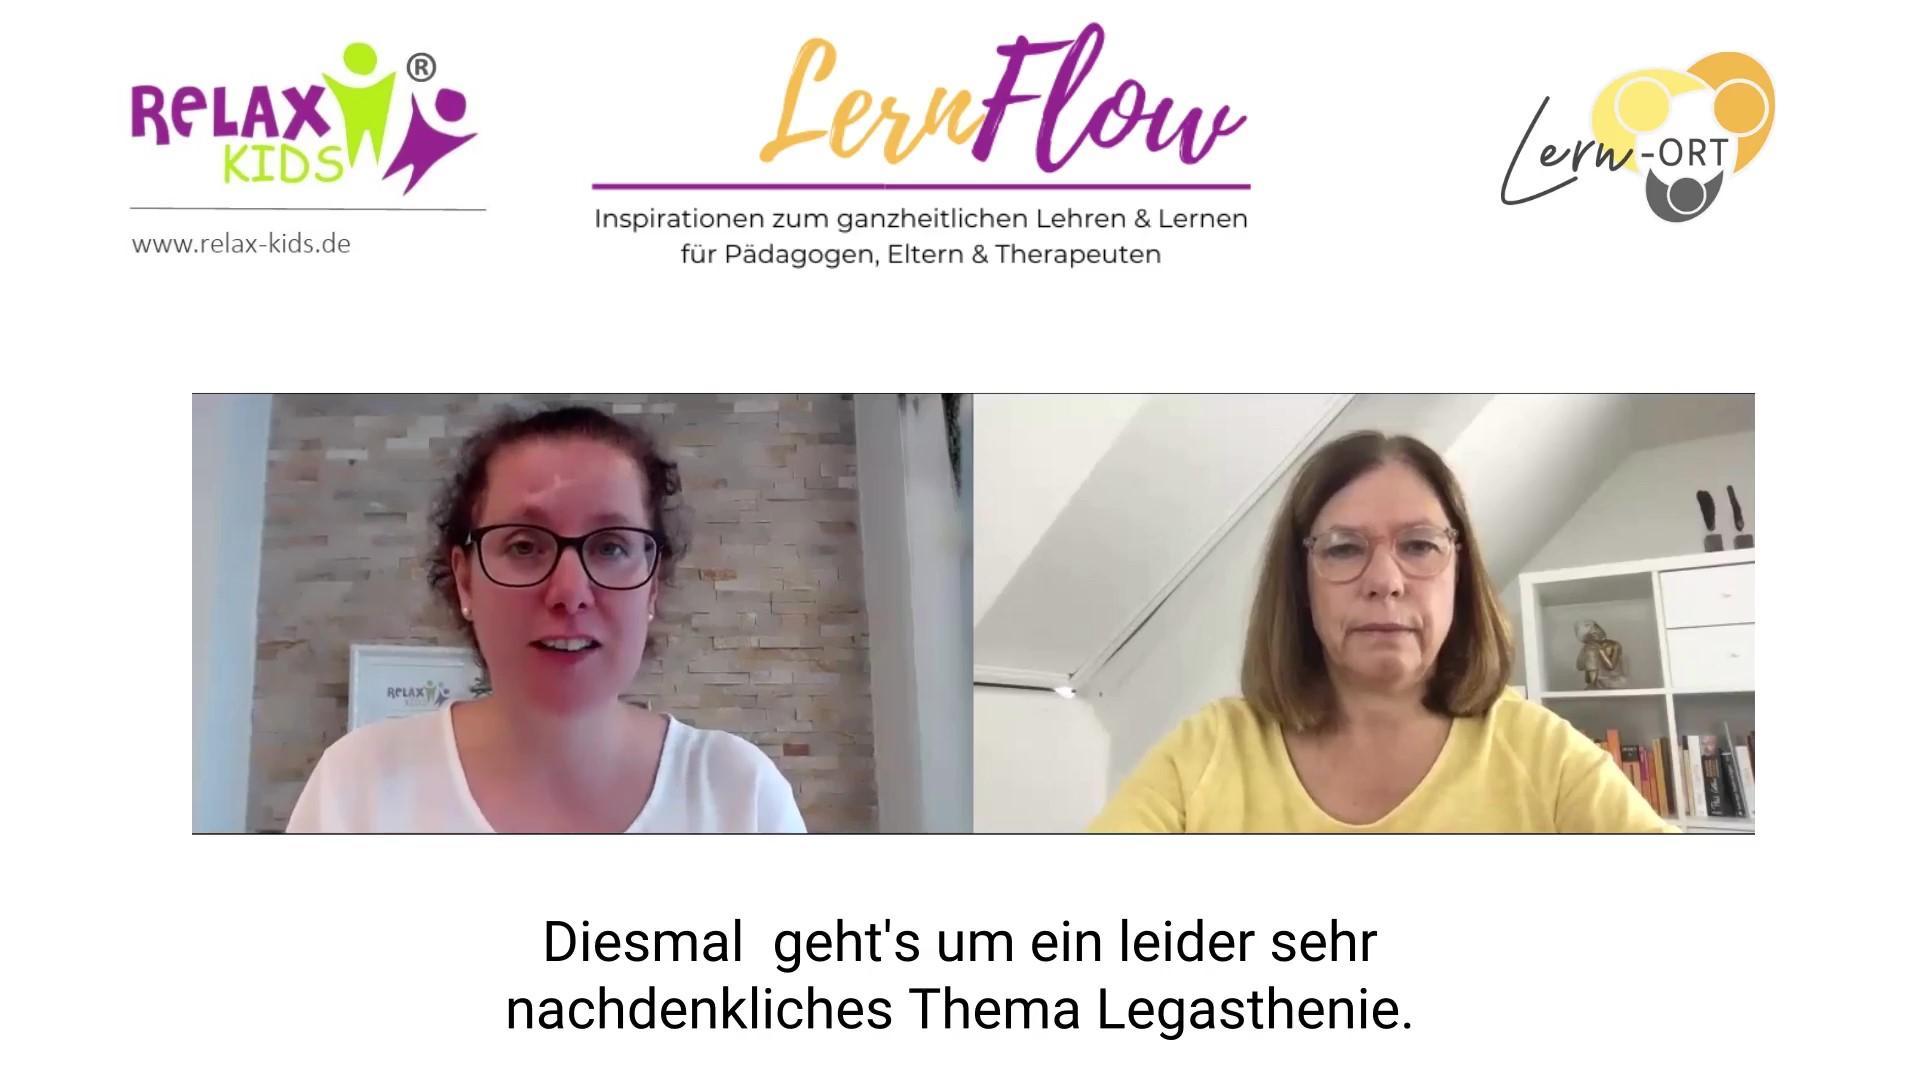 Legasthenie-Petra Rodenberg und Andrea Schmalzl